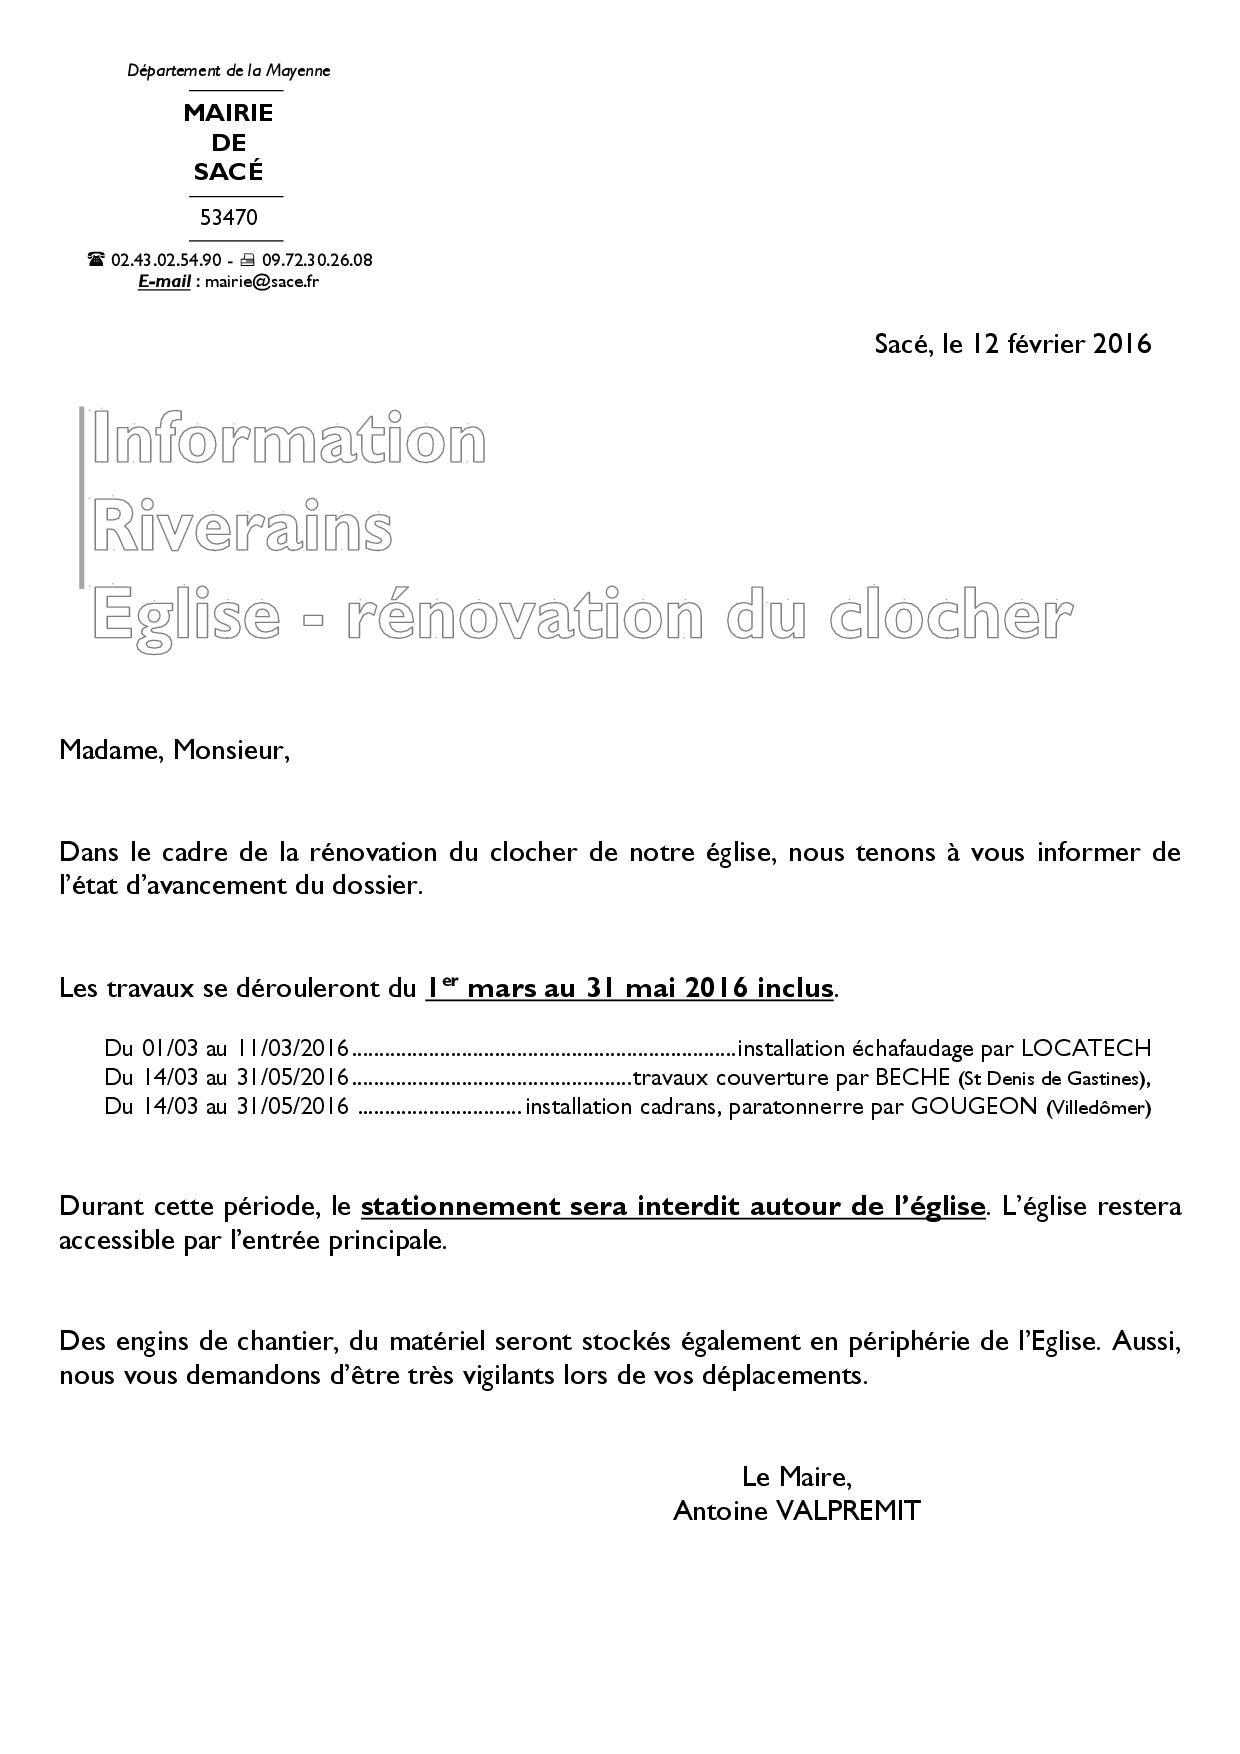 EGLISE - Information riverain 12.02.2016